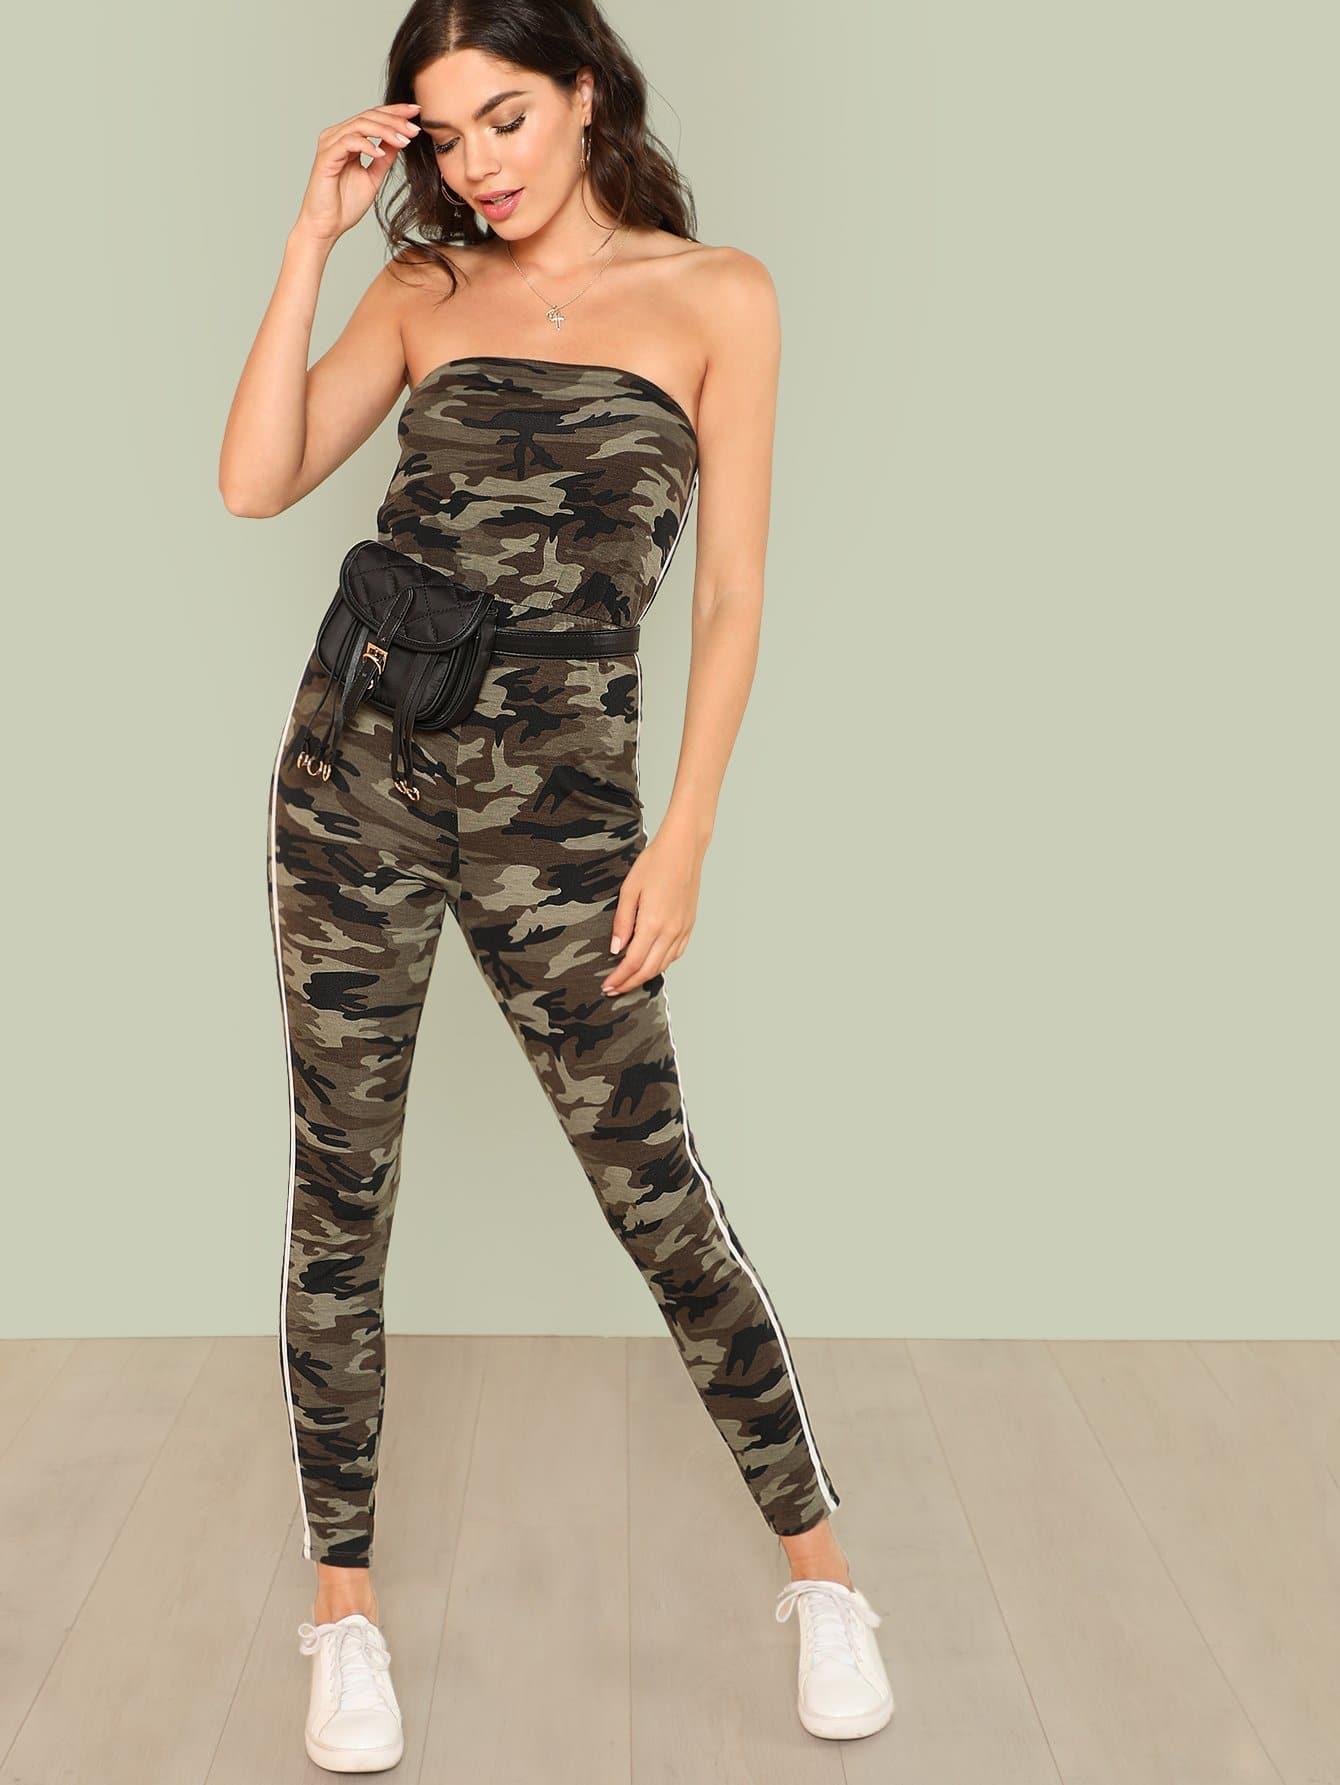 Camo Print Contrast Striped Side Strapless Jumpsuit self tie split side camo jumpsuit